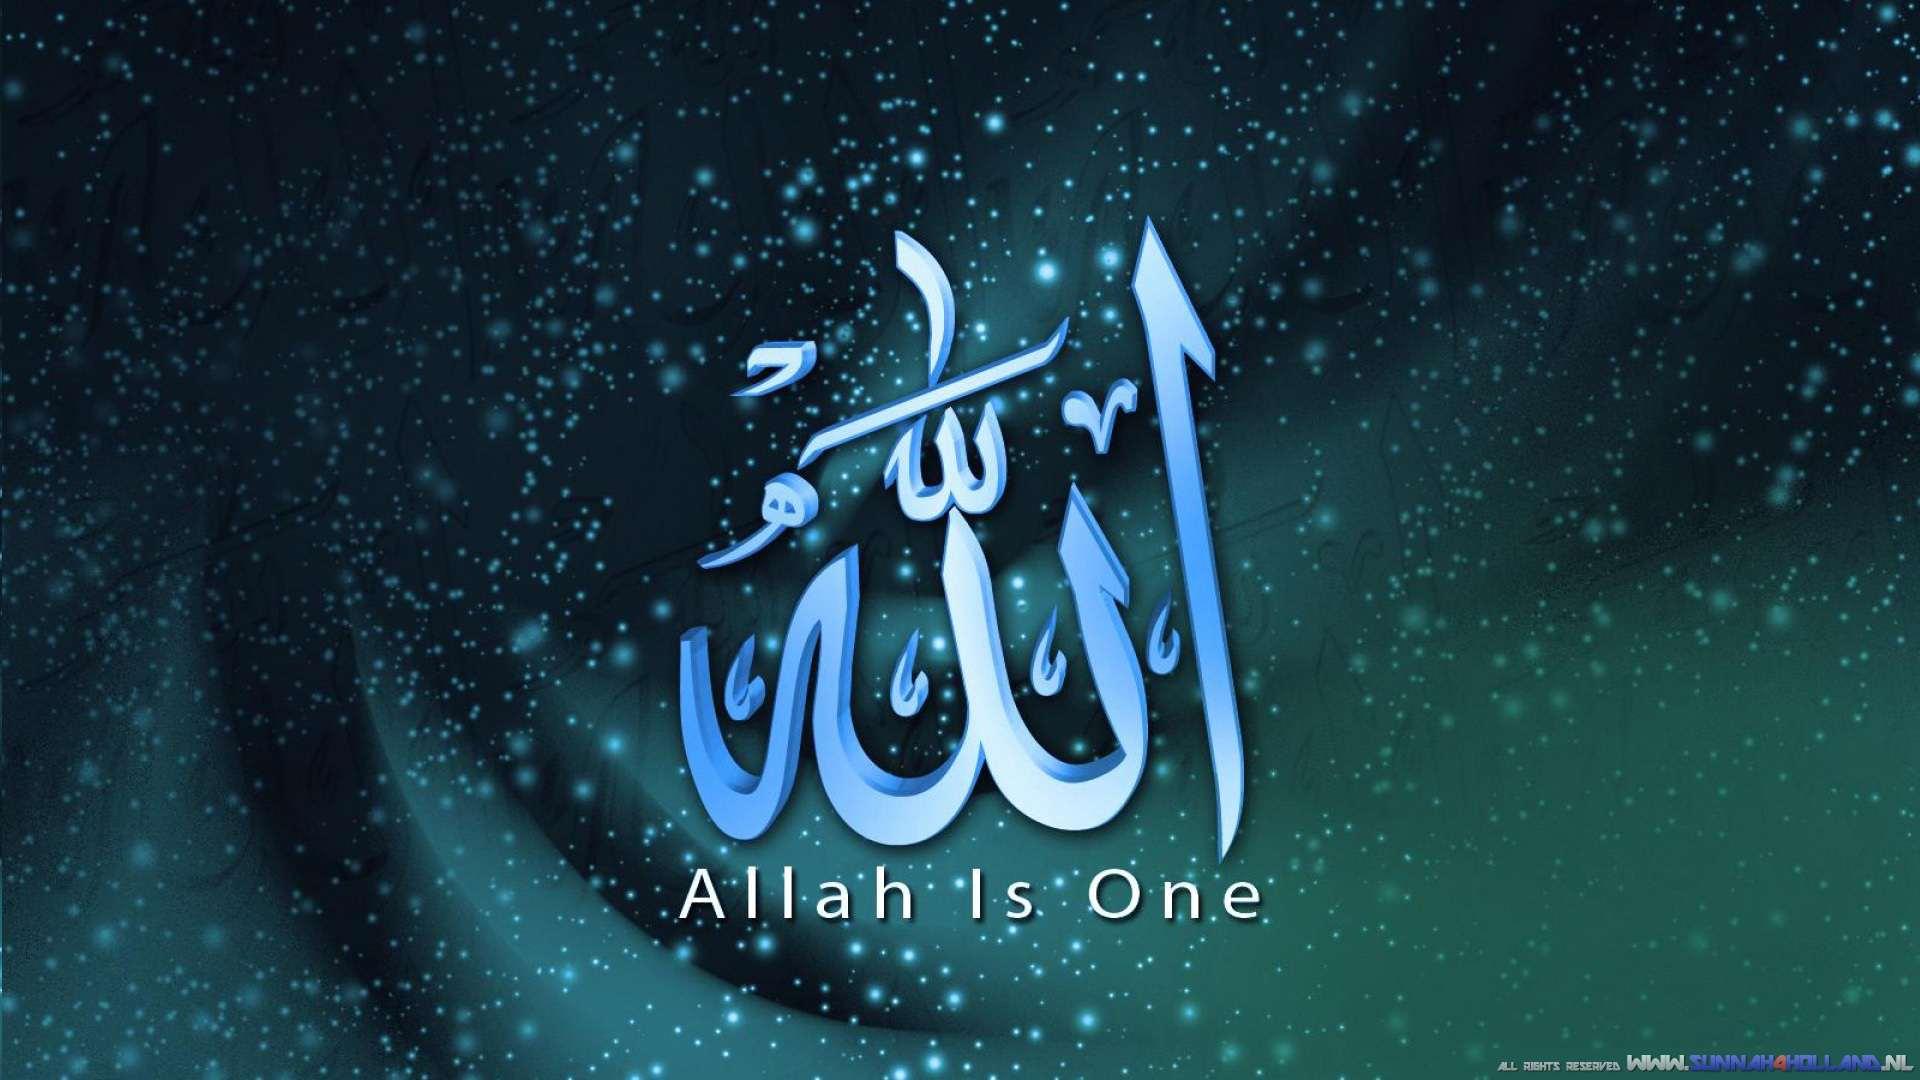 Allah Wallpapers HD Wallpaper 1920 1080. Allah Wallpaper Hd  9 Wallpapers    Wallpapers and Backgrounds